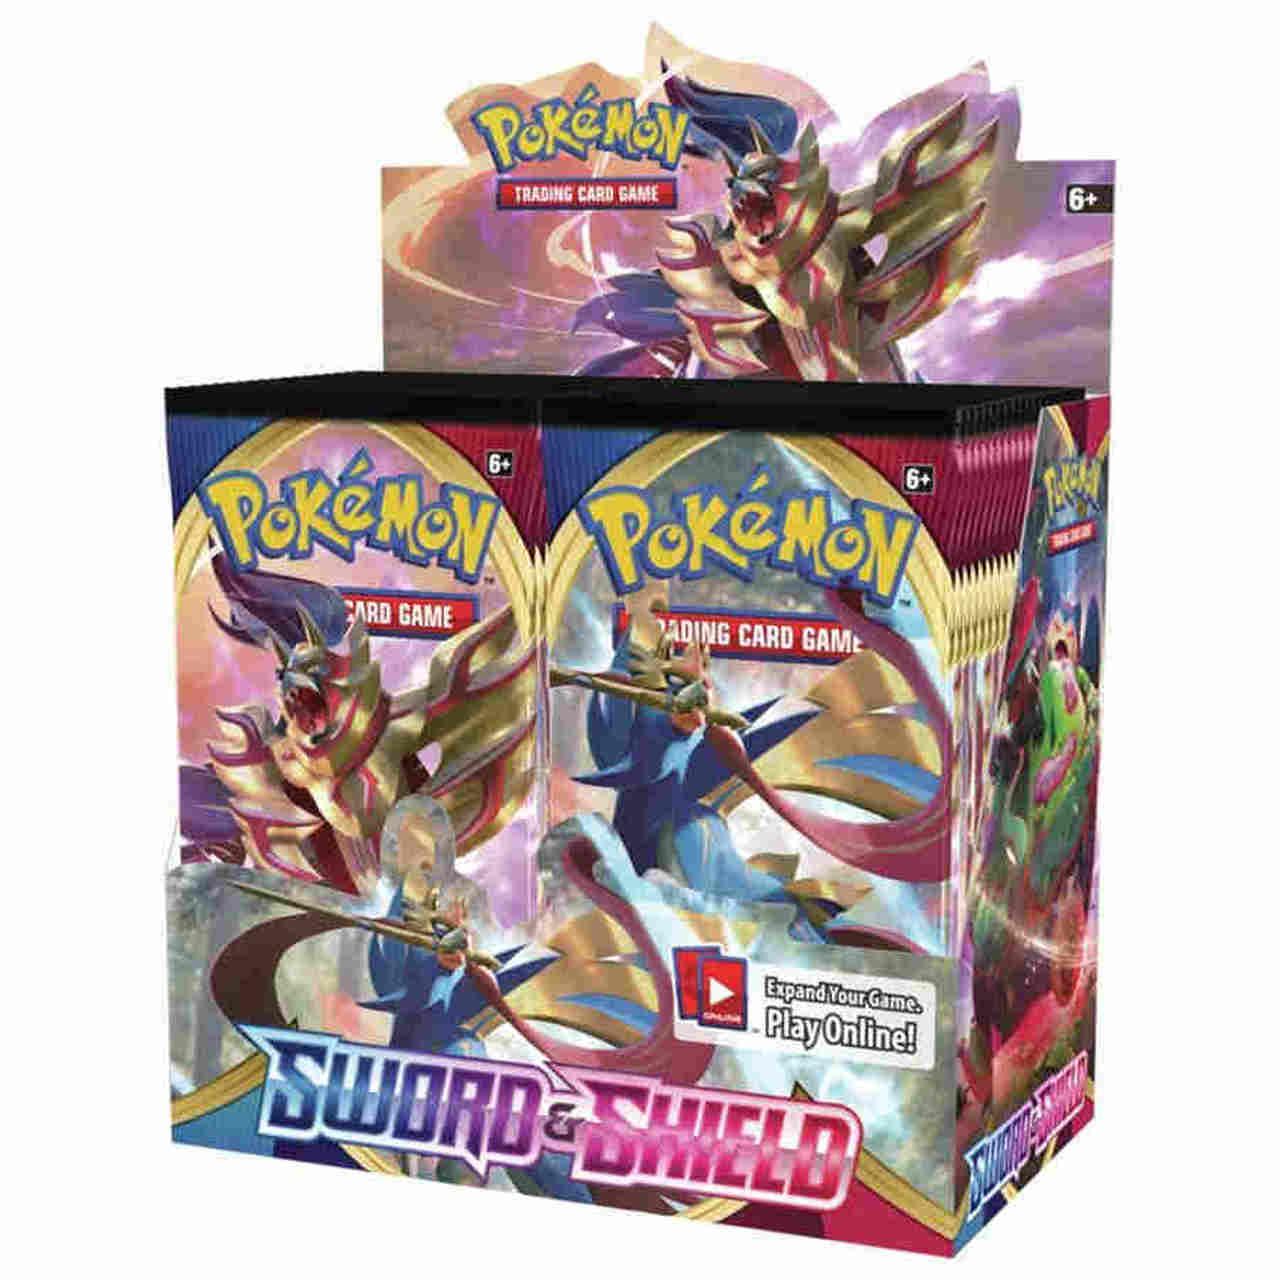 Pokemon Sword & Shield Booster Box